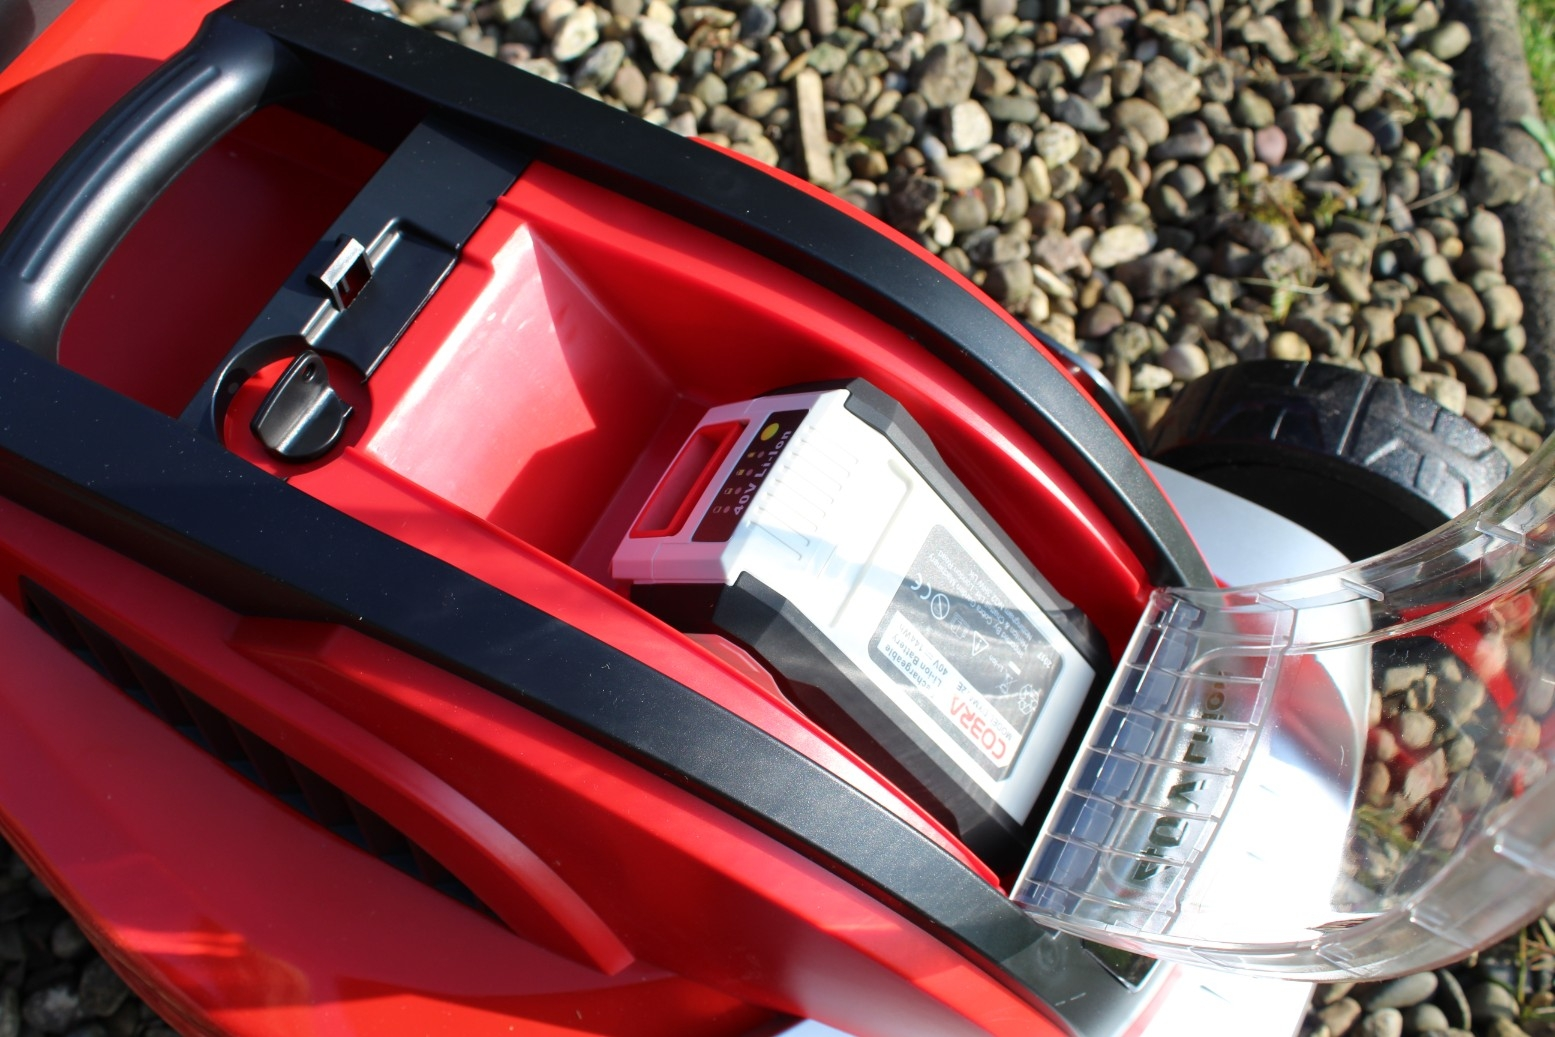 Cobra MX4140V Lithium-ion 40V Cordless Lawnmower - Review (5)